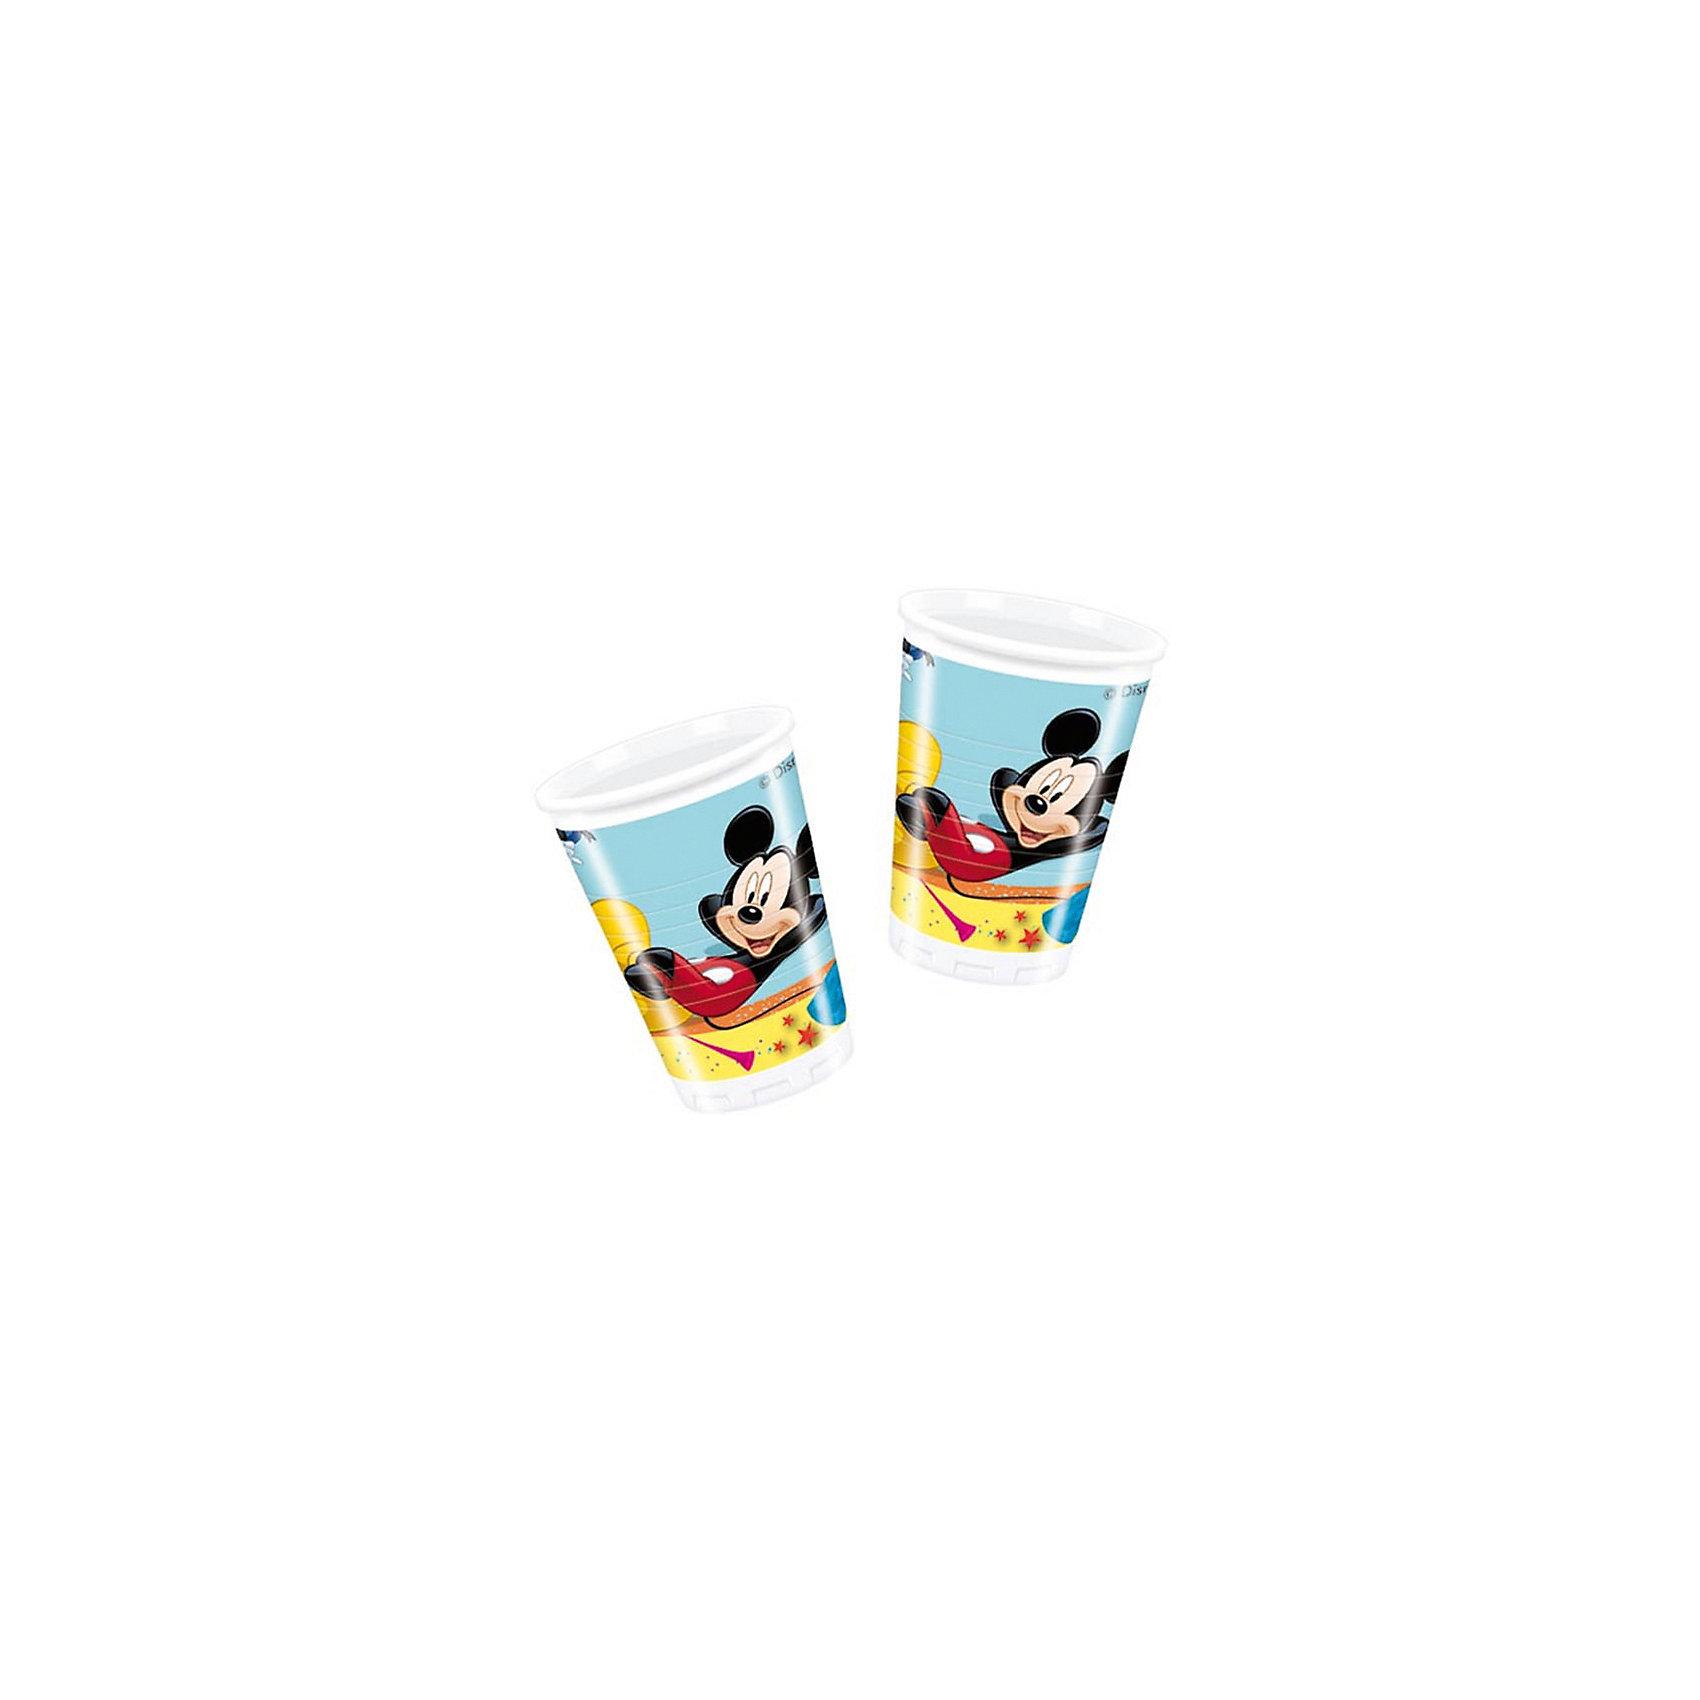 Procos Стаканы пластиковые Микки Маус на карнавале 180 мл, 10 шт. пластиковые лыжи без насечки цст 180